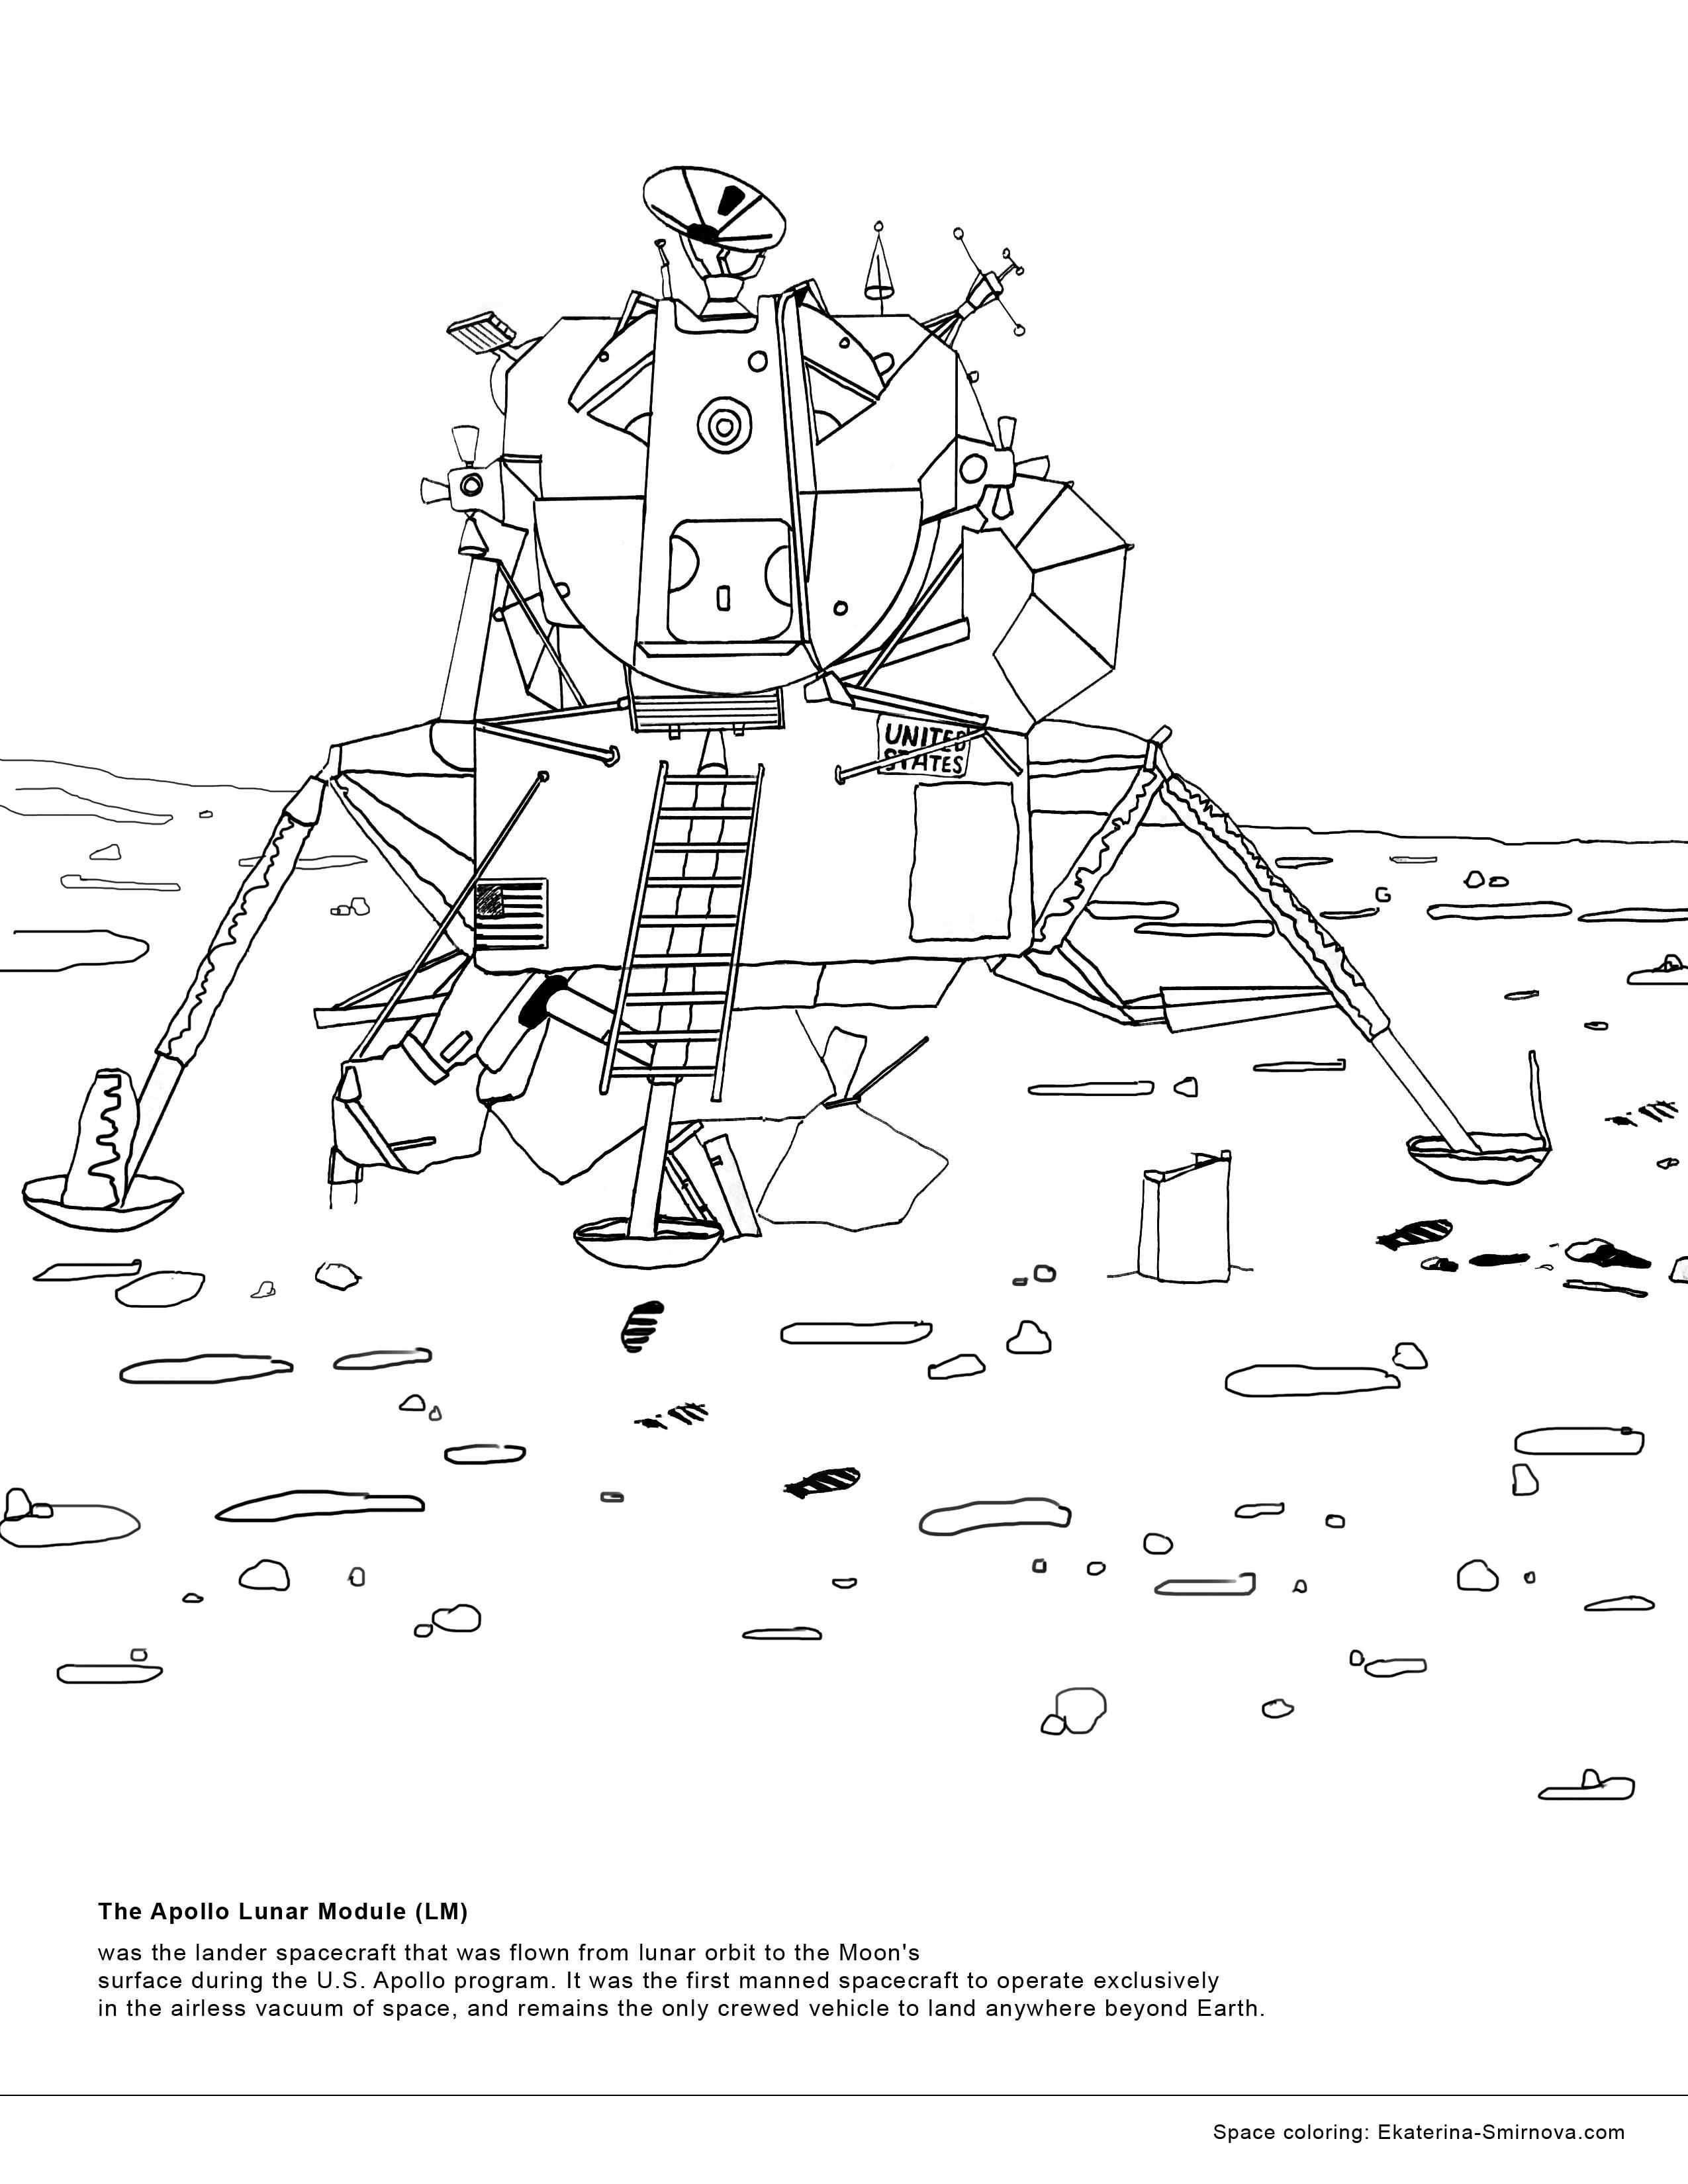 Coloring book for space missions juno rosetta cassini